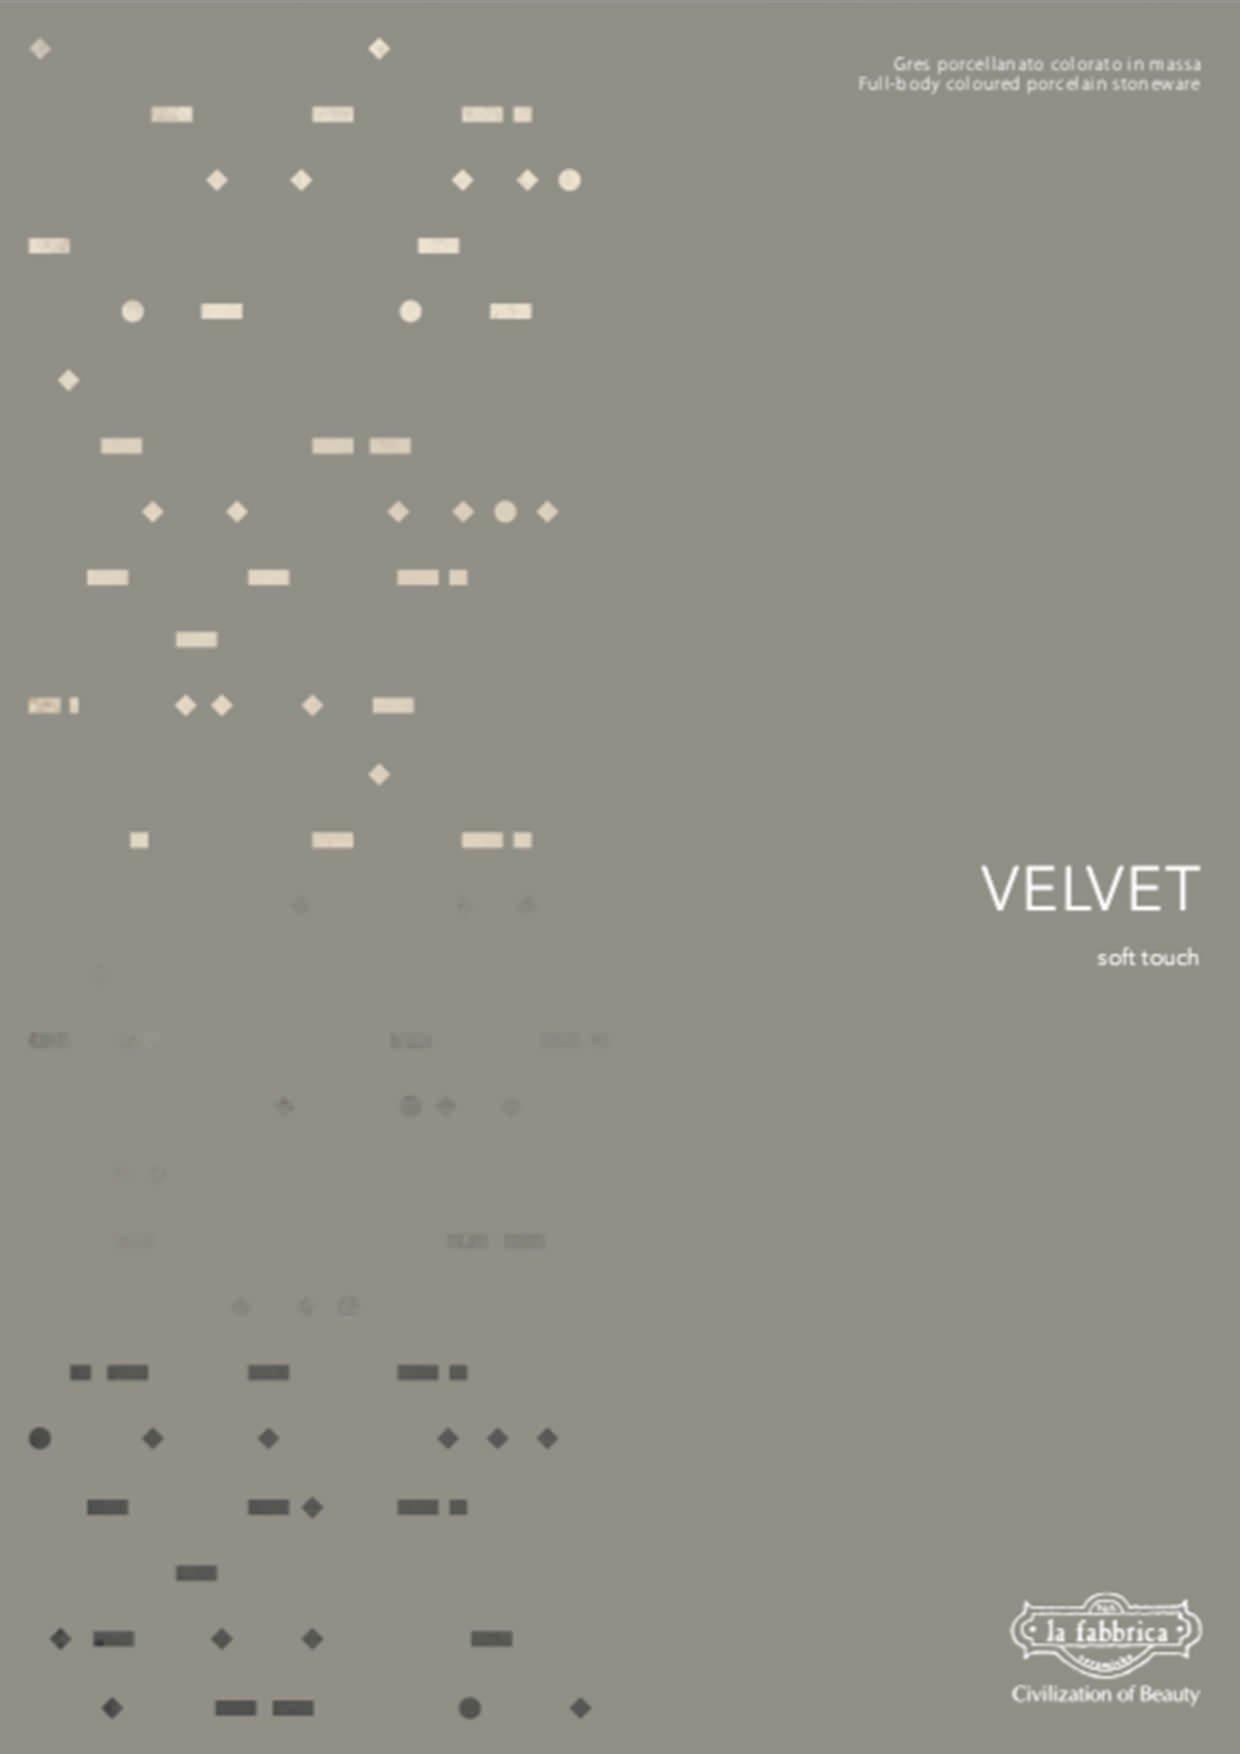 La Fabbrica Catalogo Velvet